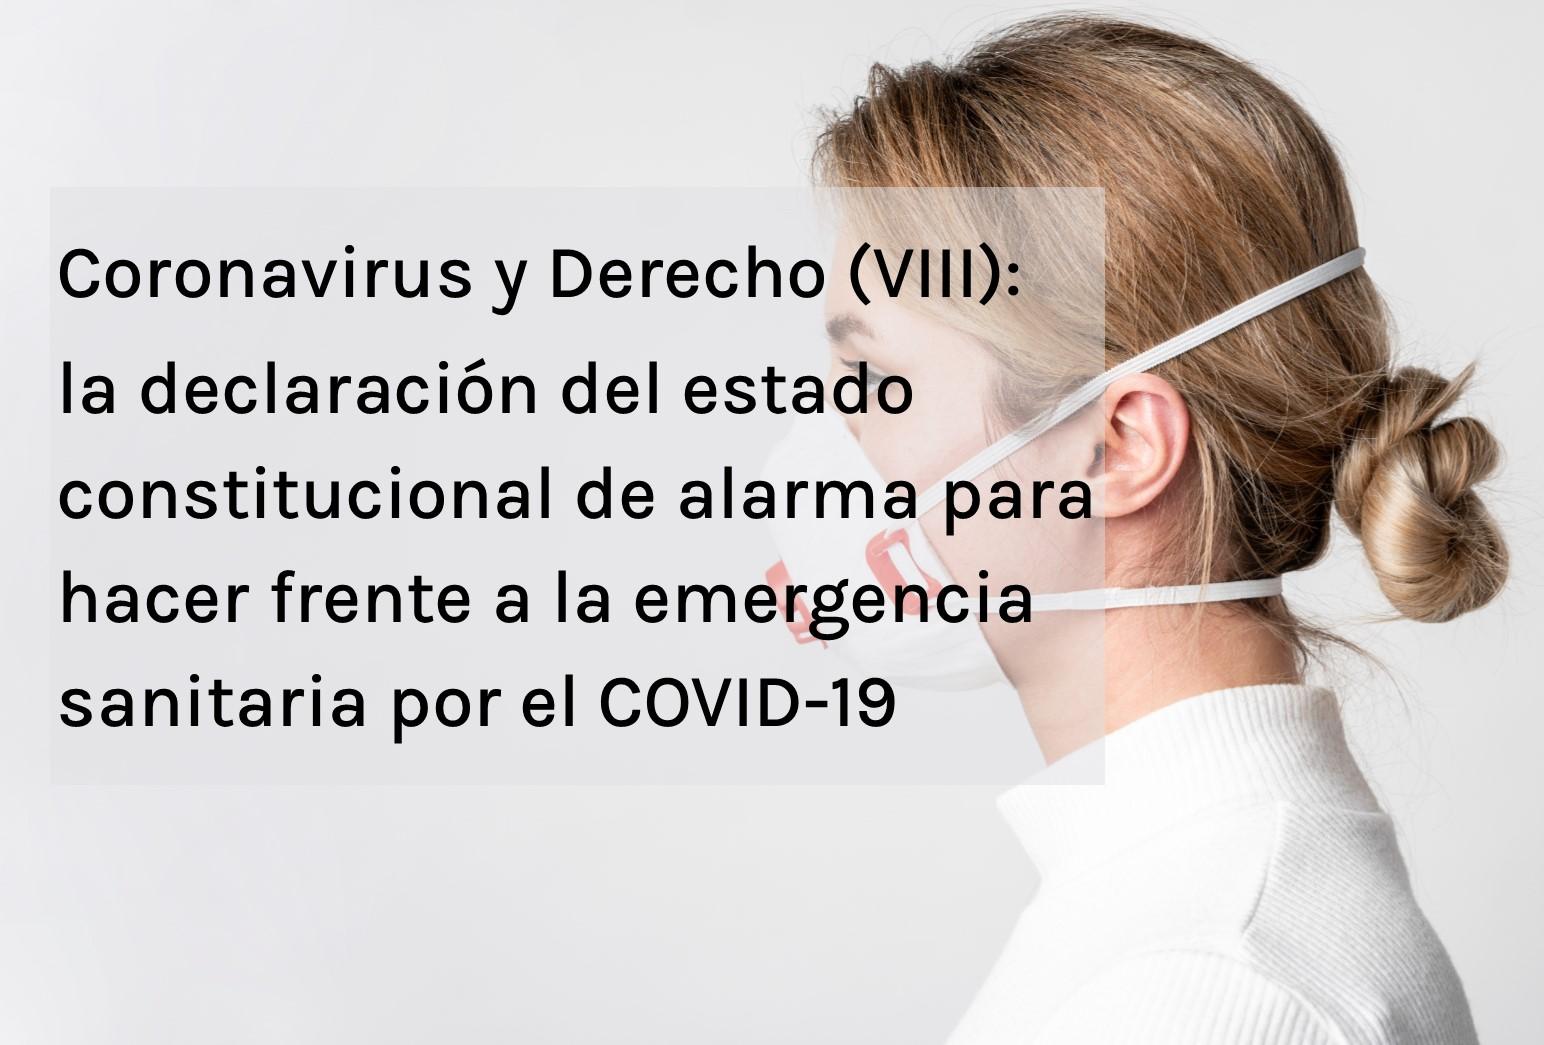 Coronavirus y Derecho (VIII)